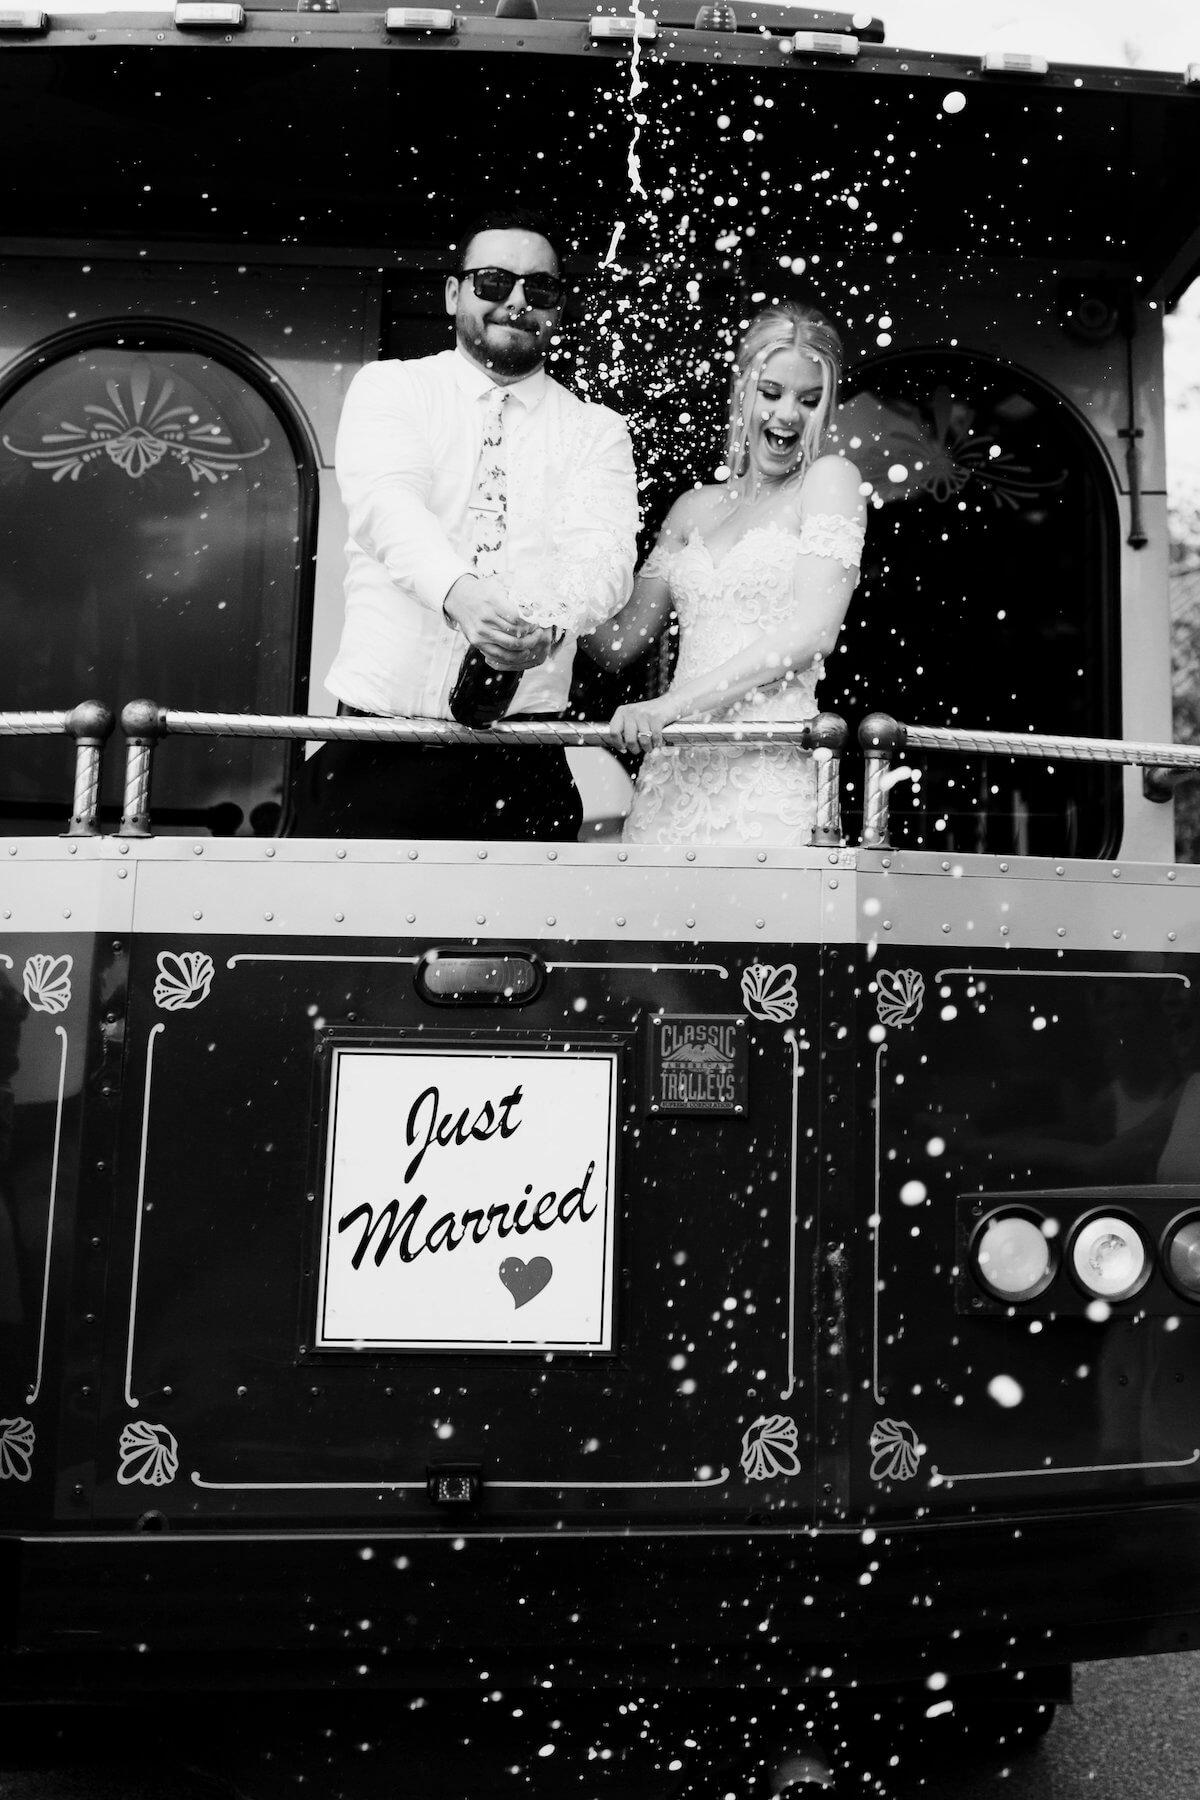 engle-olson-april-cj-wedding-jessica-holleque-7.jpg